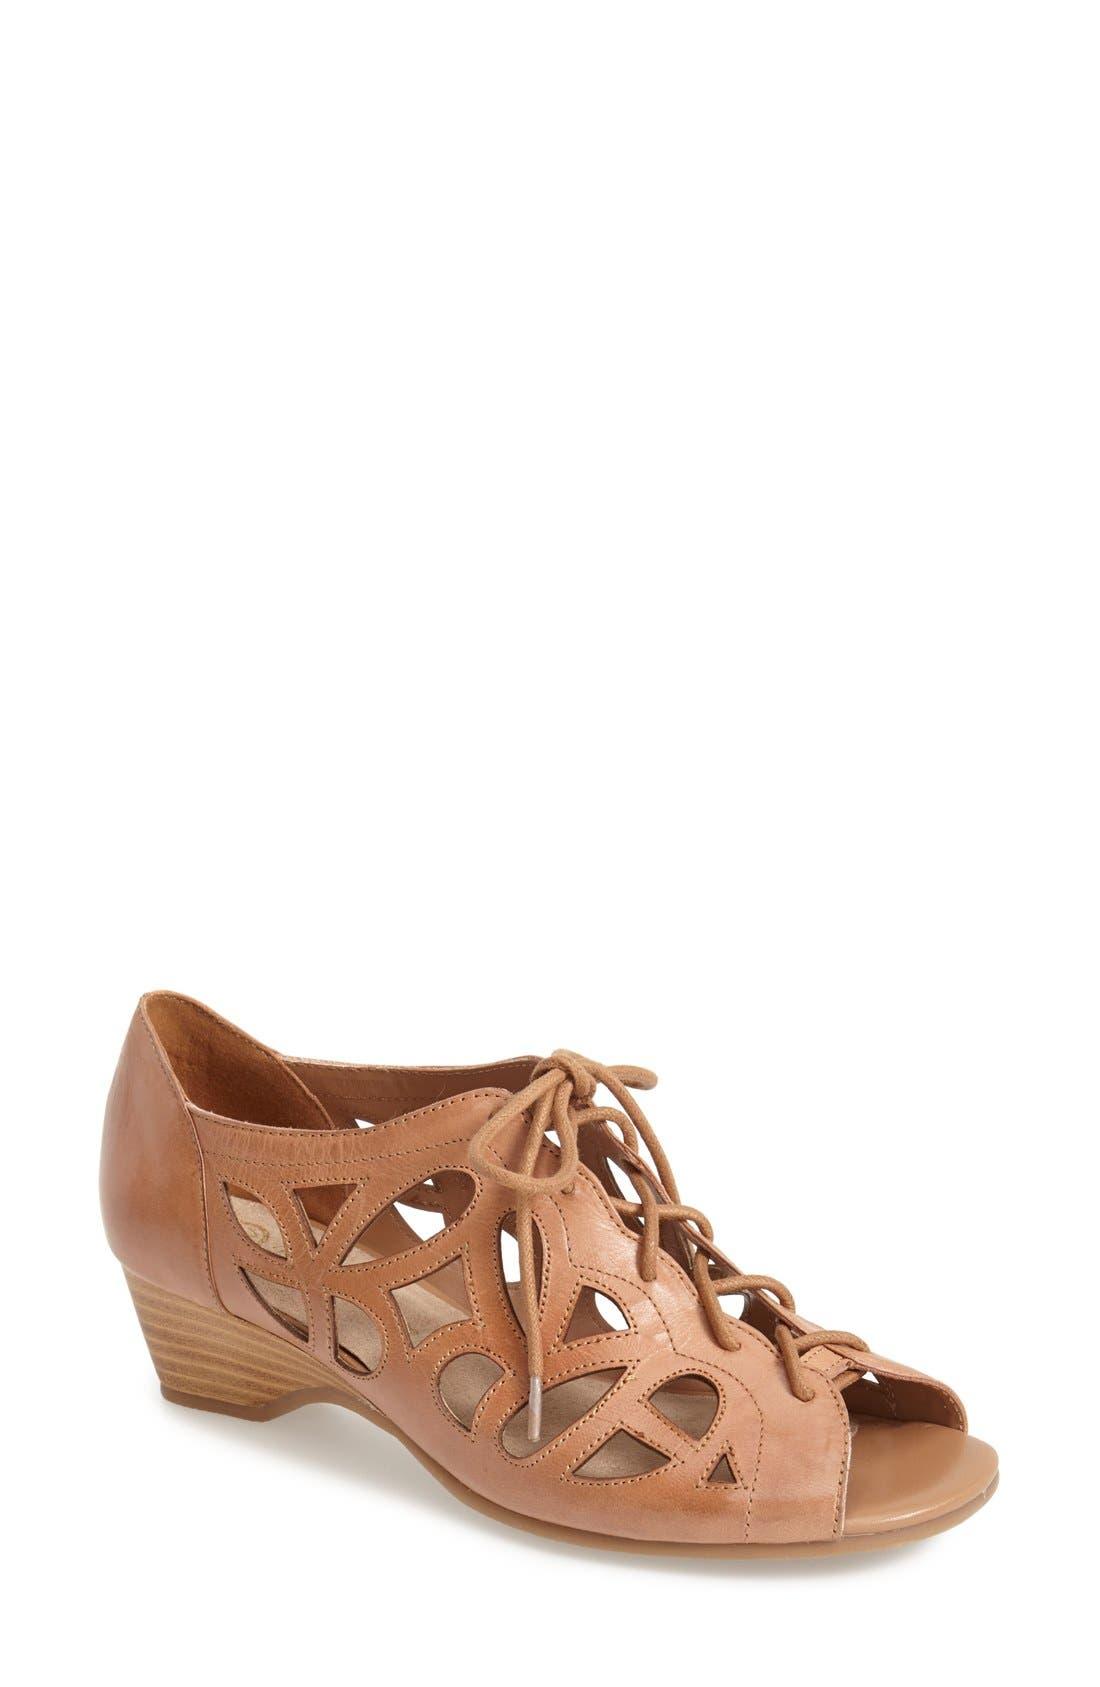 Main Image - Bella Vita 'Pixie' Lace Up Cutout Leather Sandal